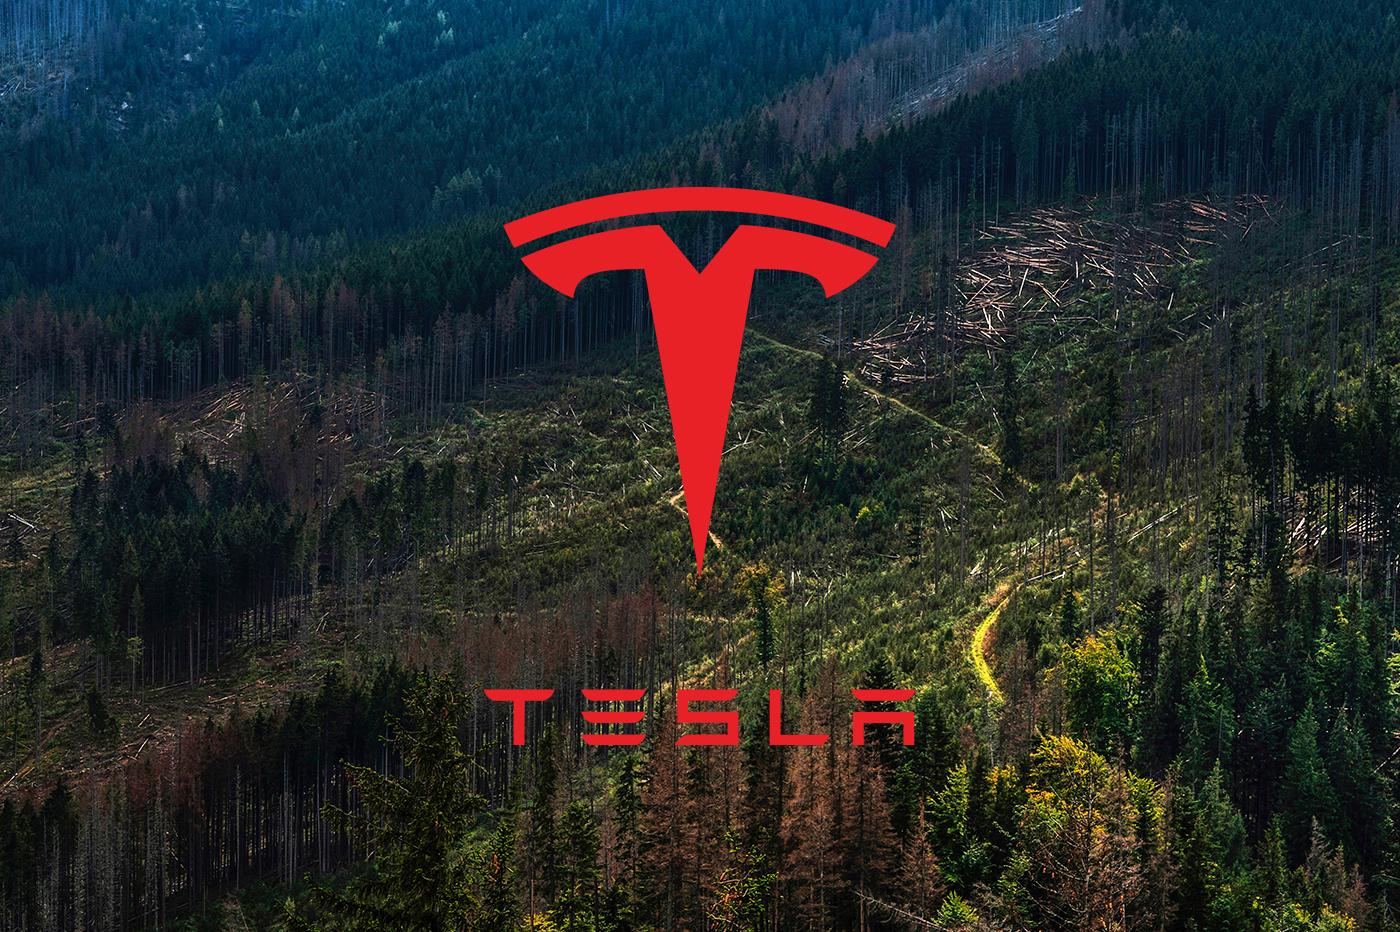 Tesla obtient l'approbation de raser la forêt berlinoise pour y implanter sa Gigafactory